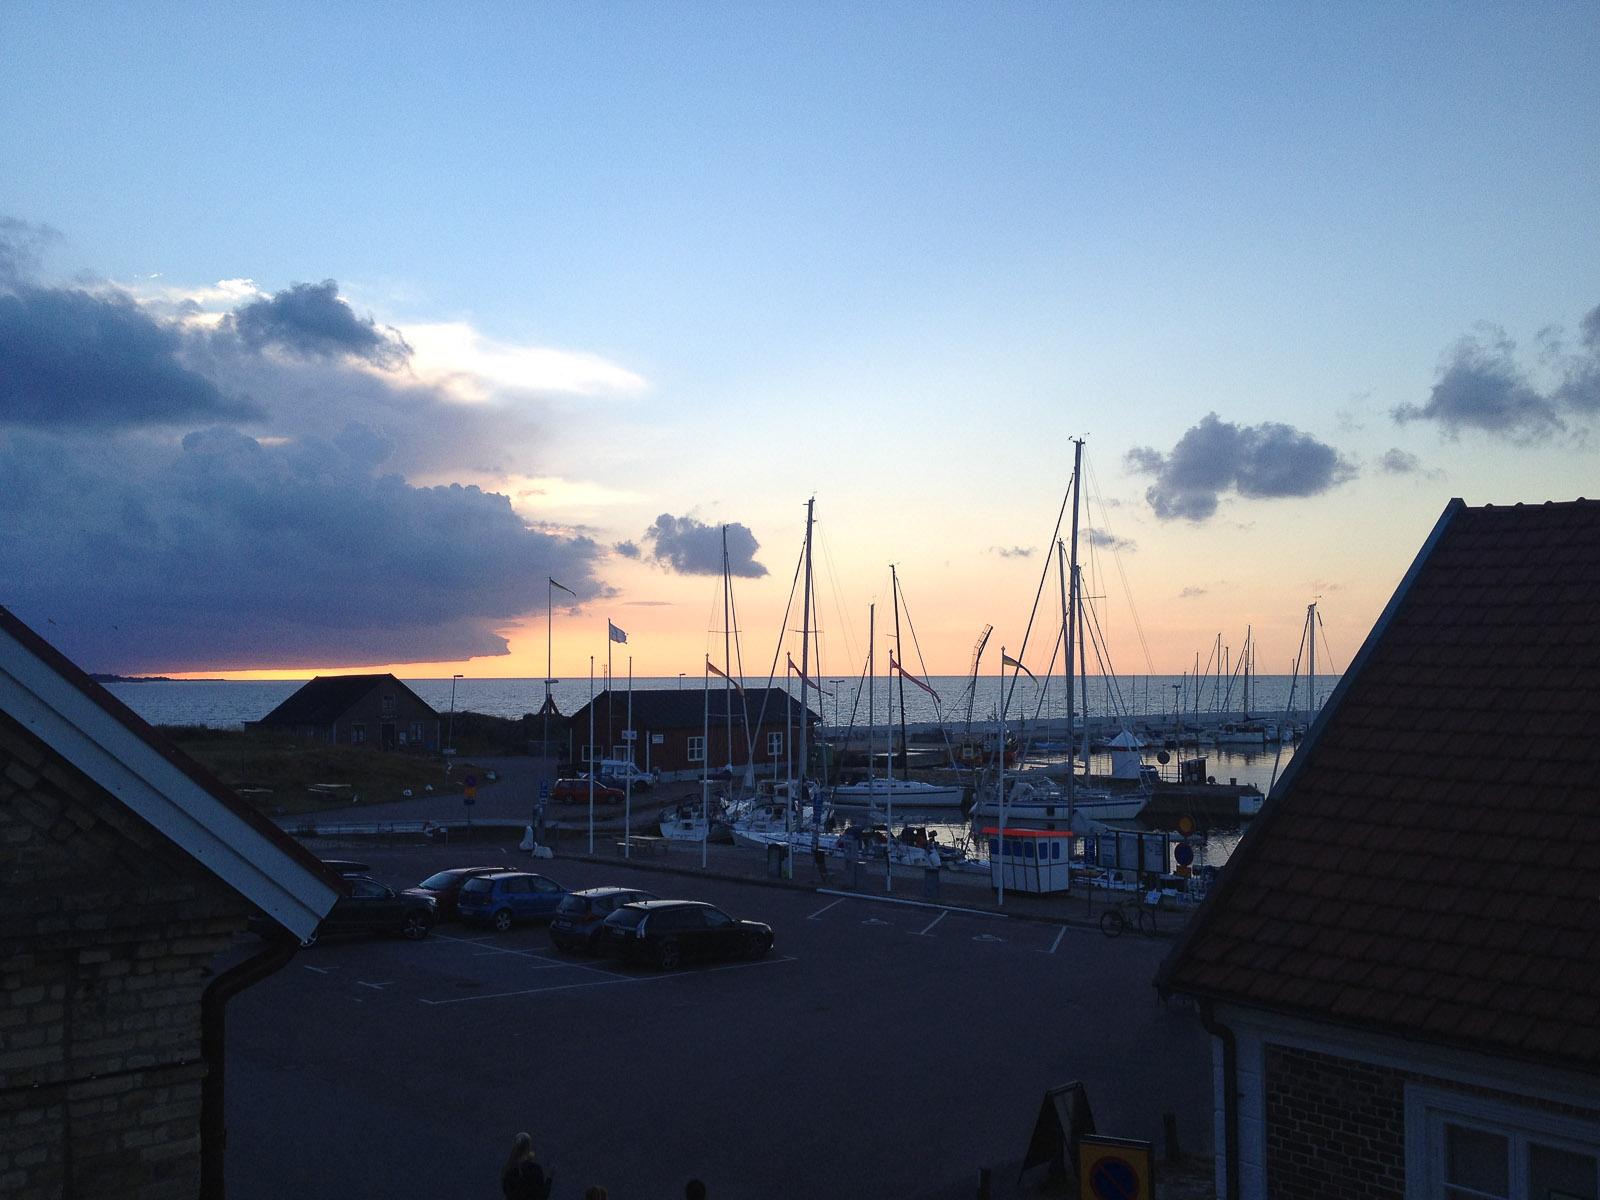 Sunshinestories-surf-travel-blog-IMG_6869